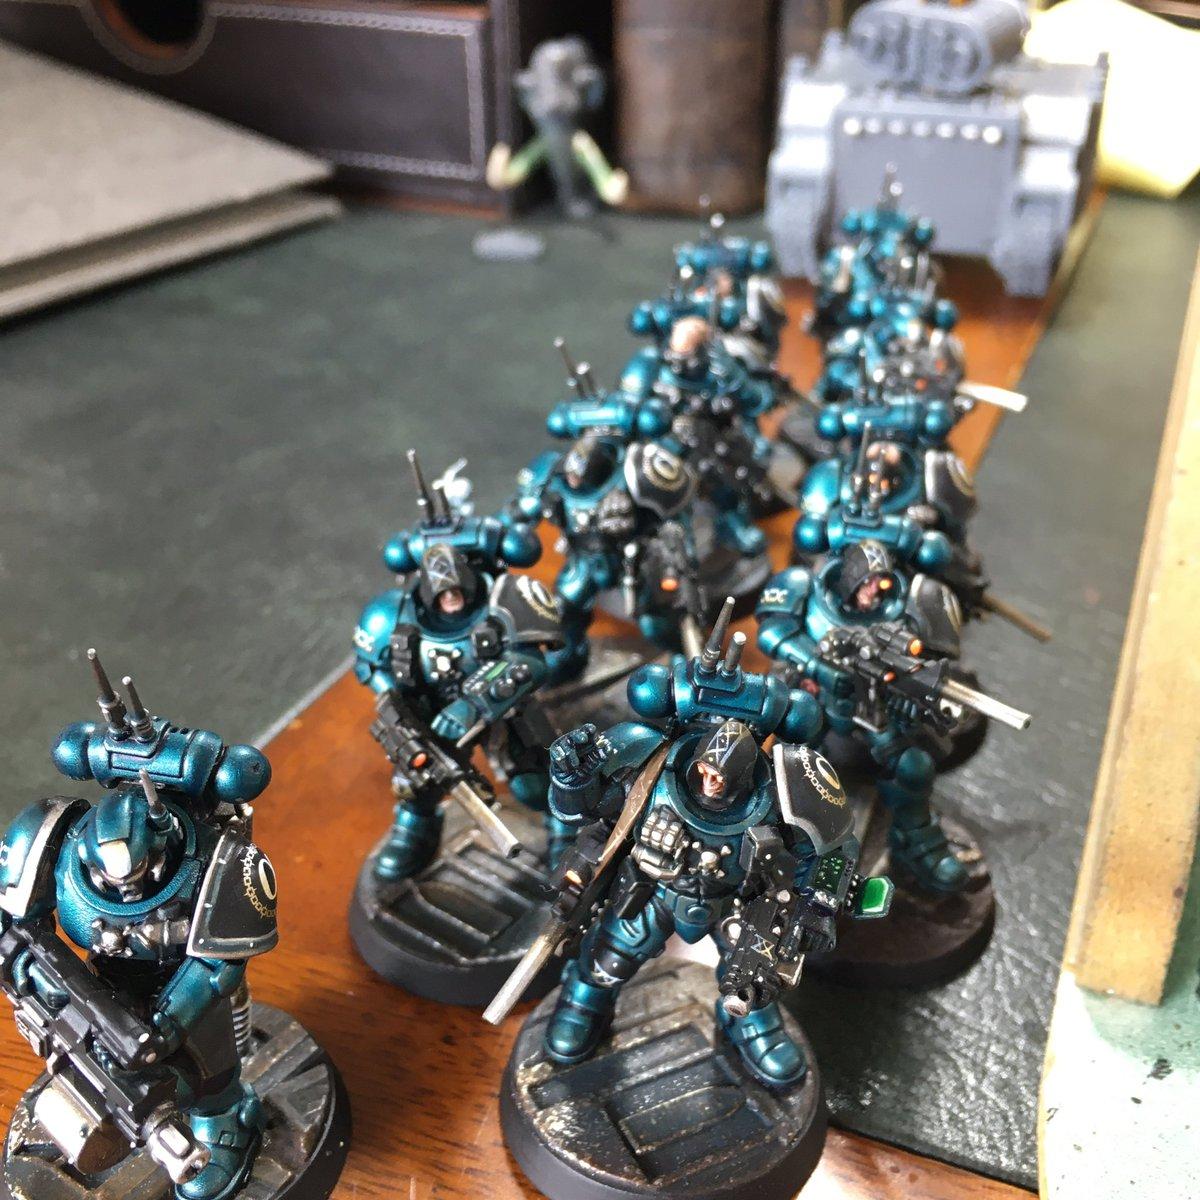 Alpha Legion assembling!   #paintingwarhammer #gamesworkshop #warhammer40k #paintingblacklibrary #paintingwarhammer40k #warhammercomunity #paintingforgeworld #spacemarines #new40k #adeptusastartes https://t.co/qawf36TpuS